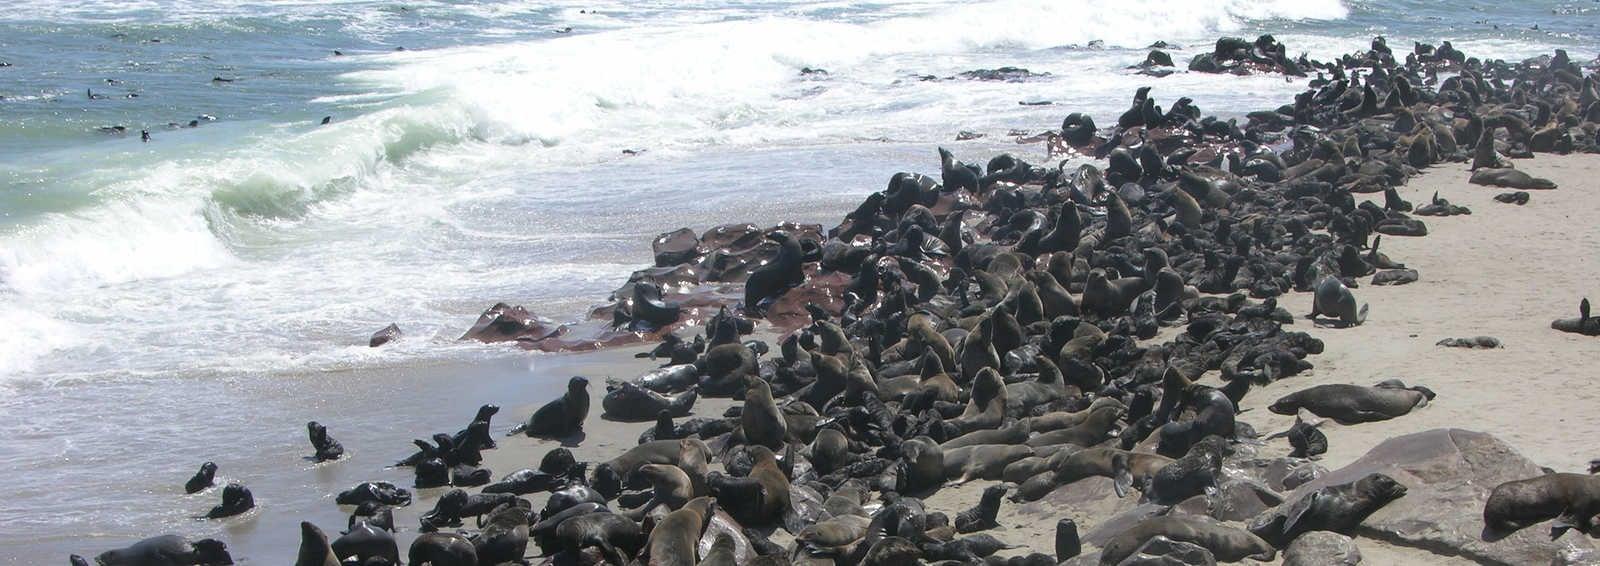 Seals at Cape Cross, Namibia